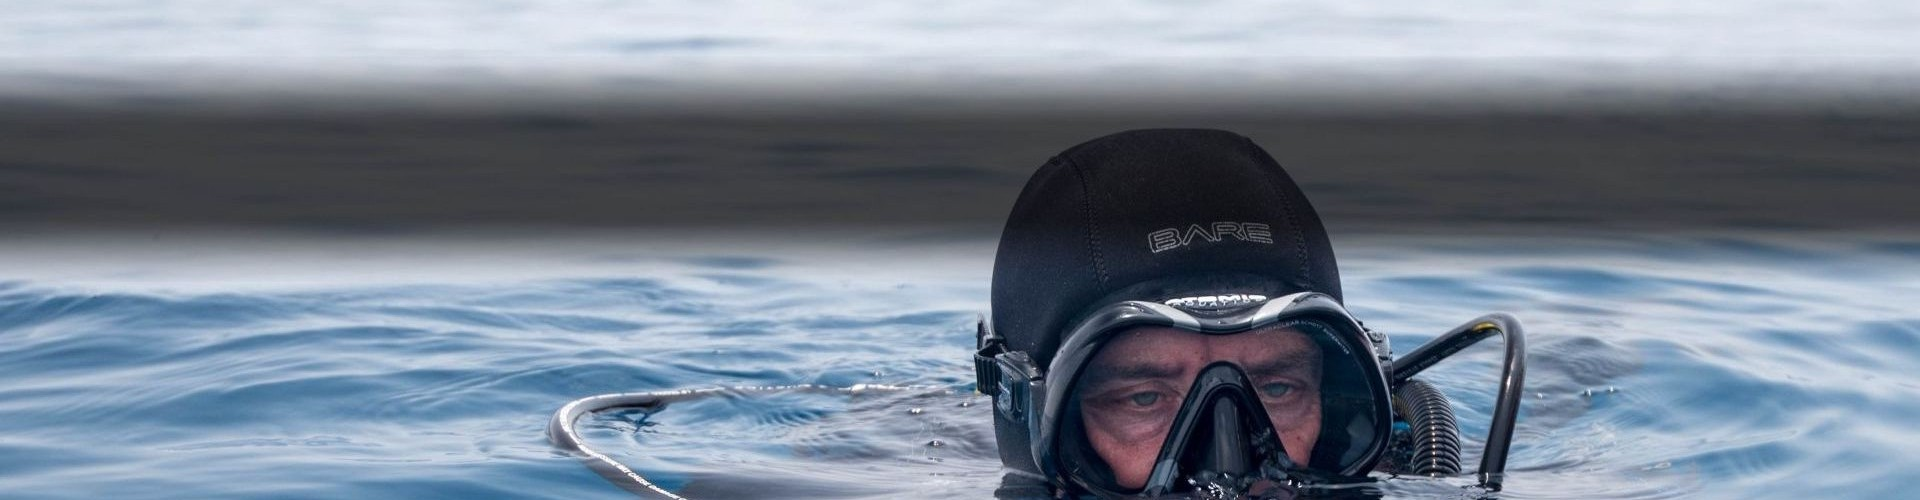 Rescue Diver Soon